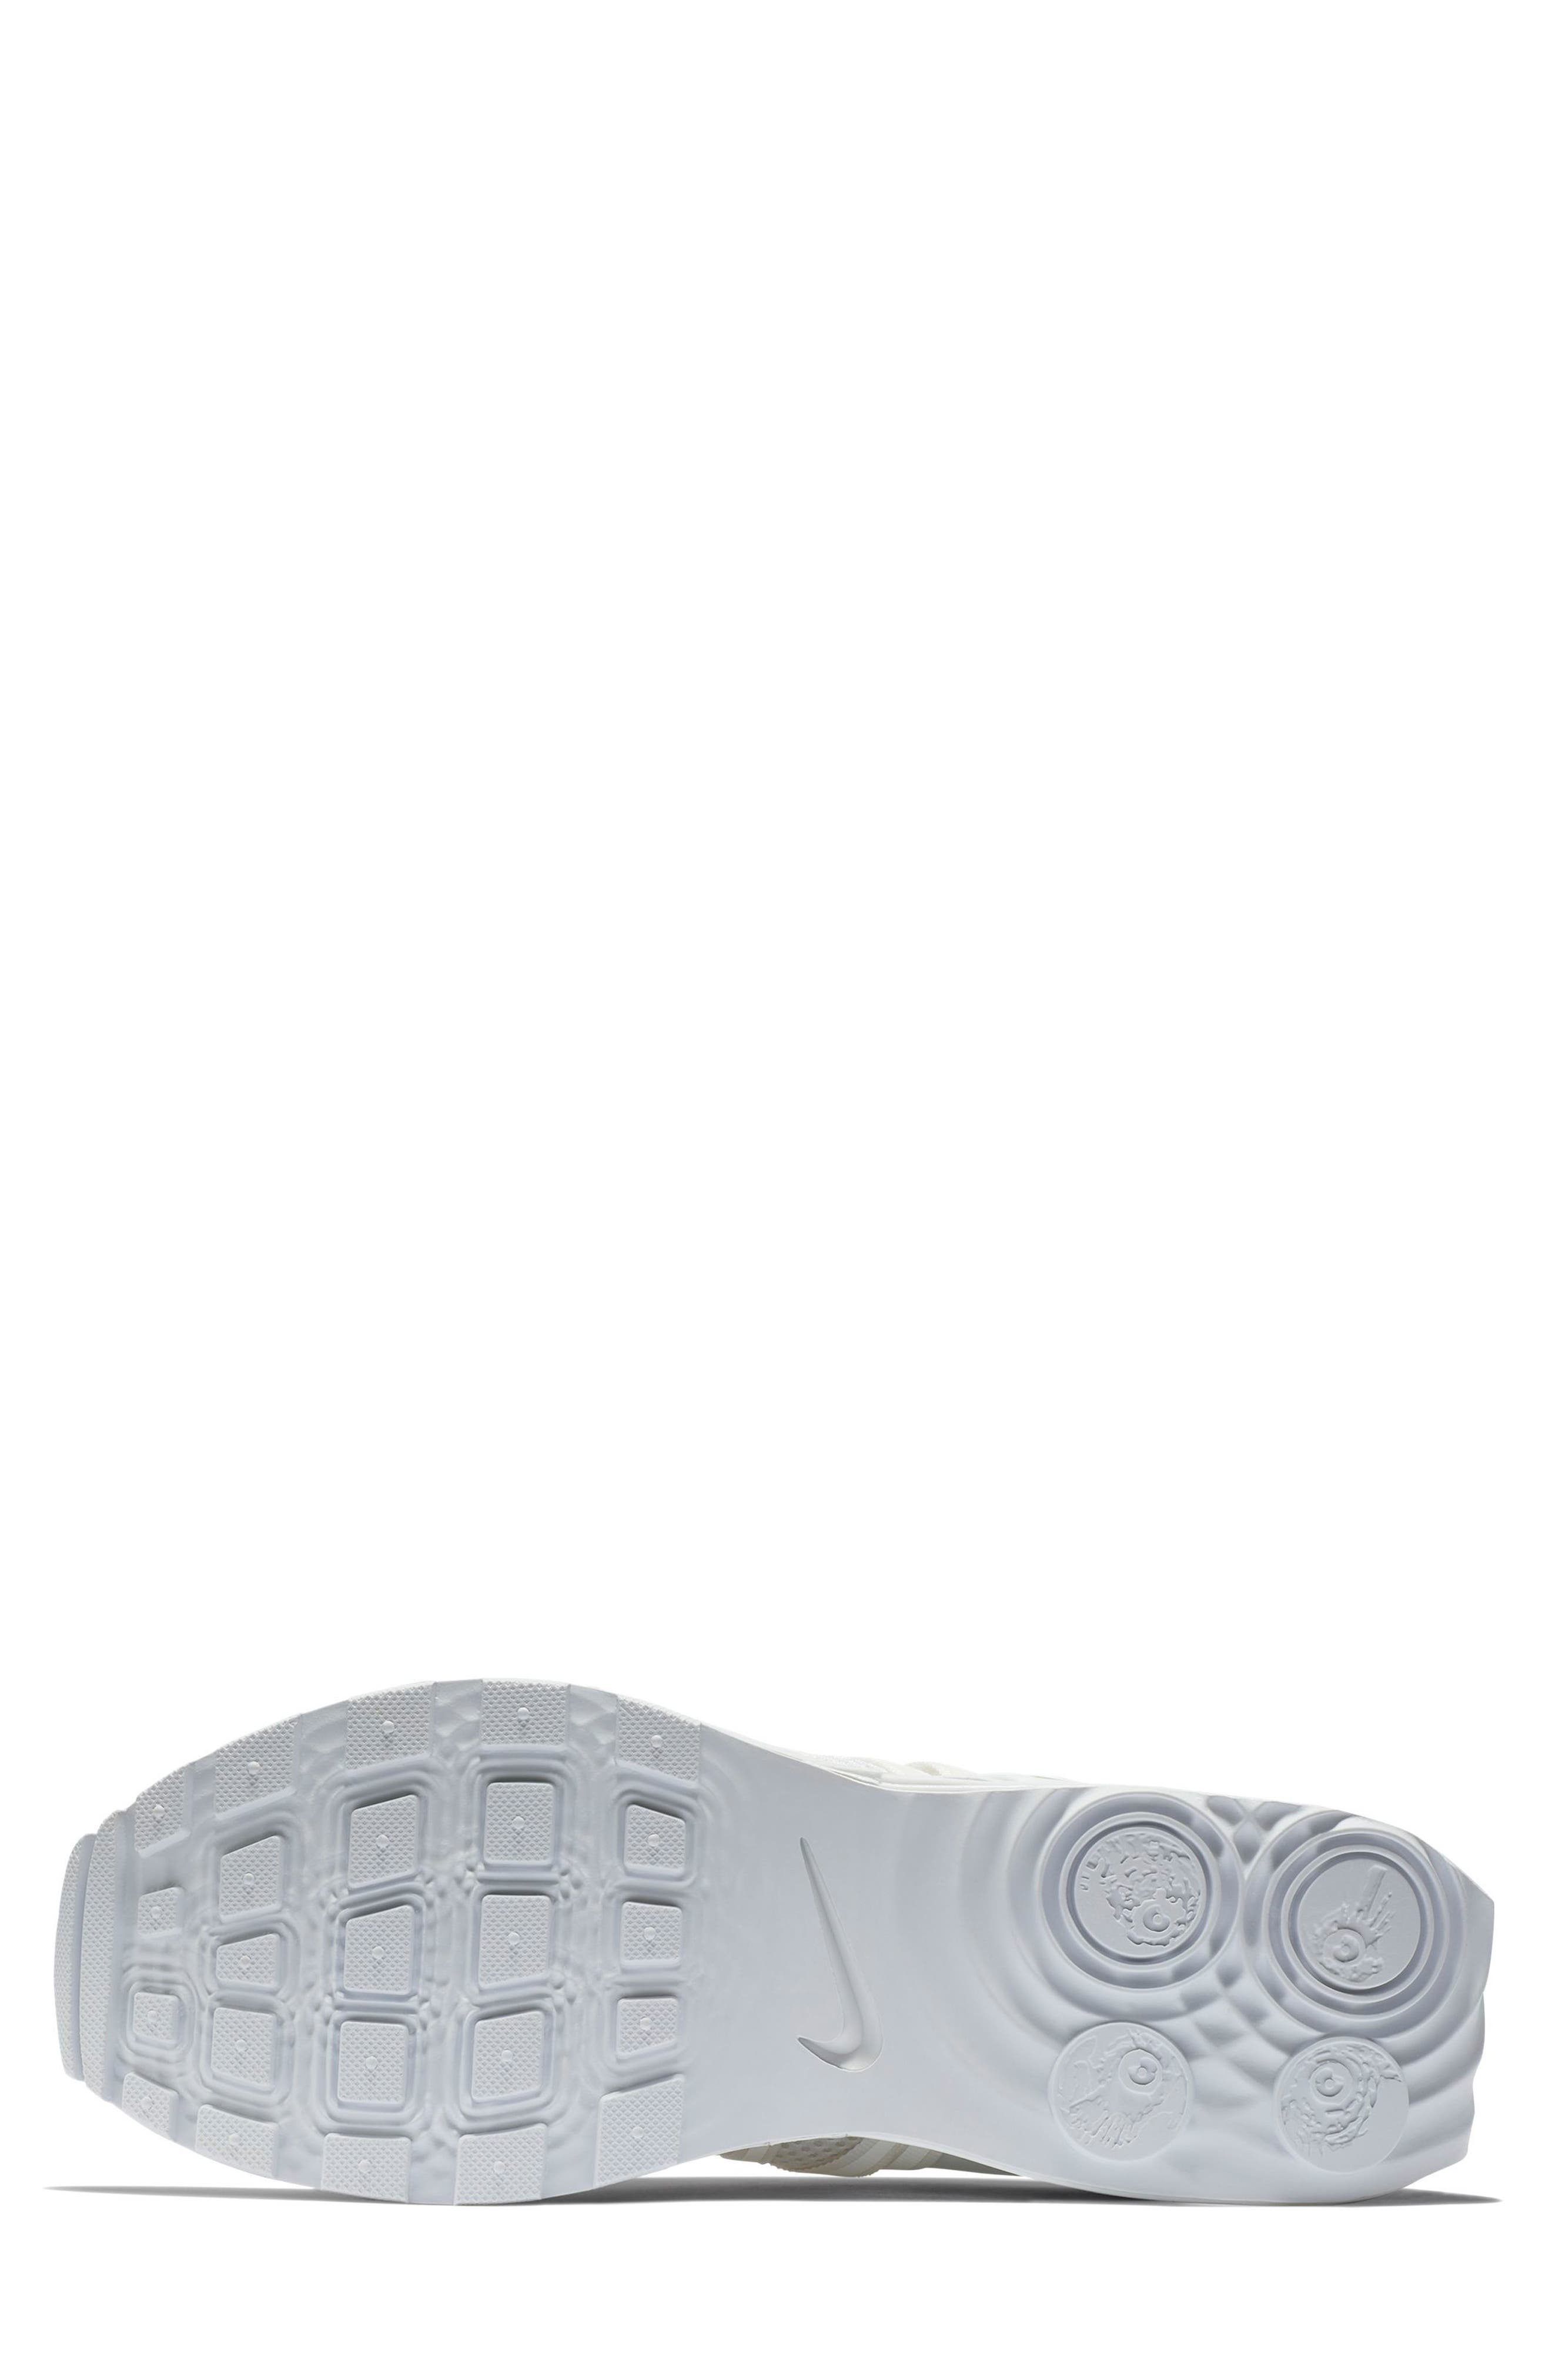 NIKE, Shox Gravity Sneaker, Alternate thumbnail 5, color, 100